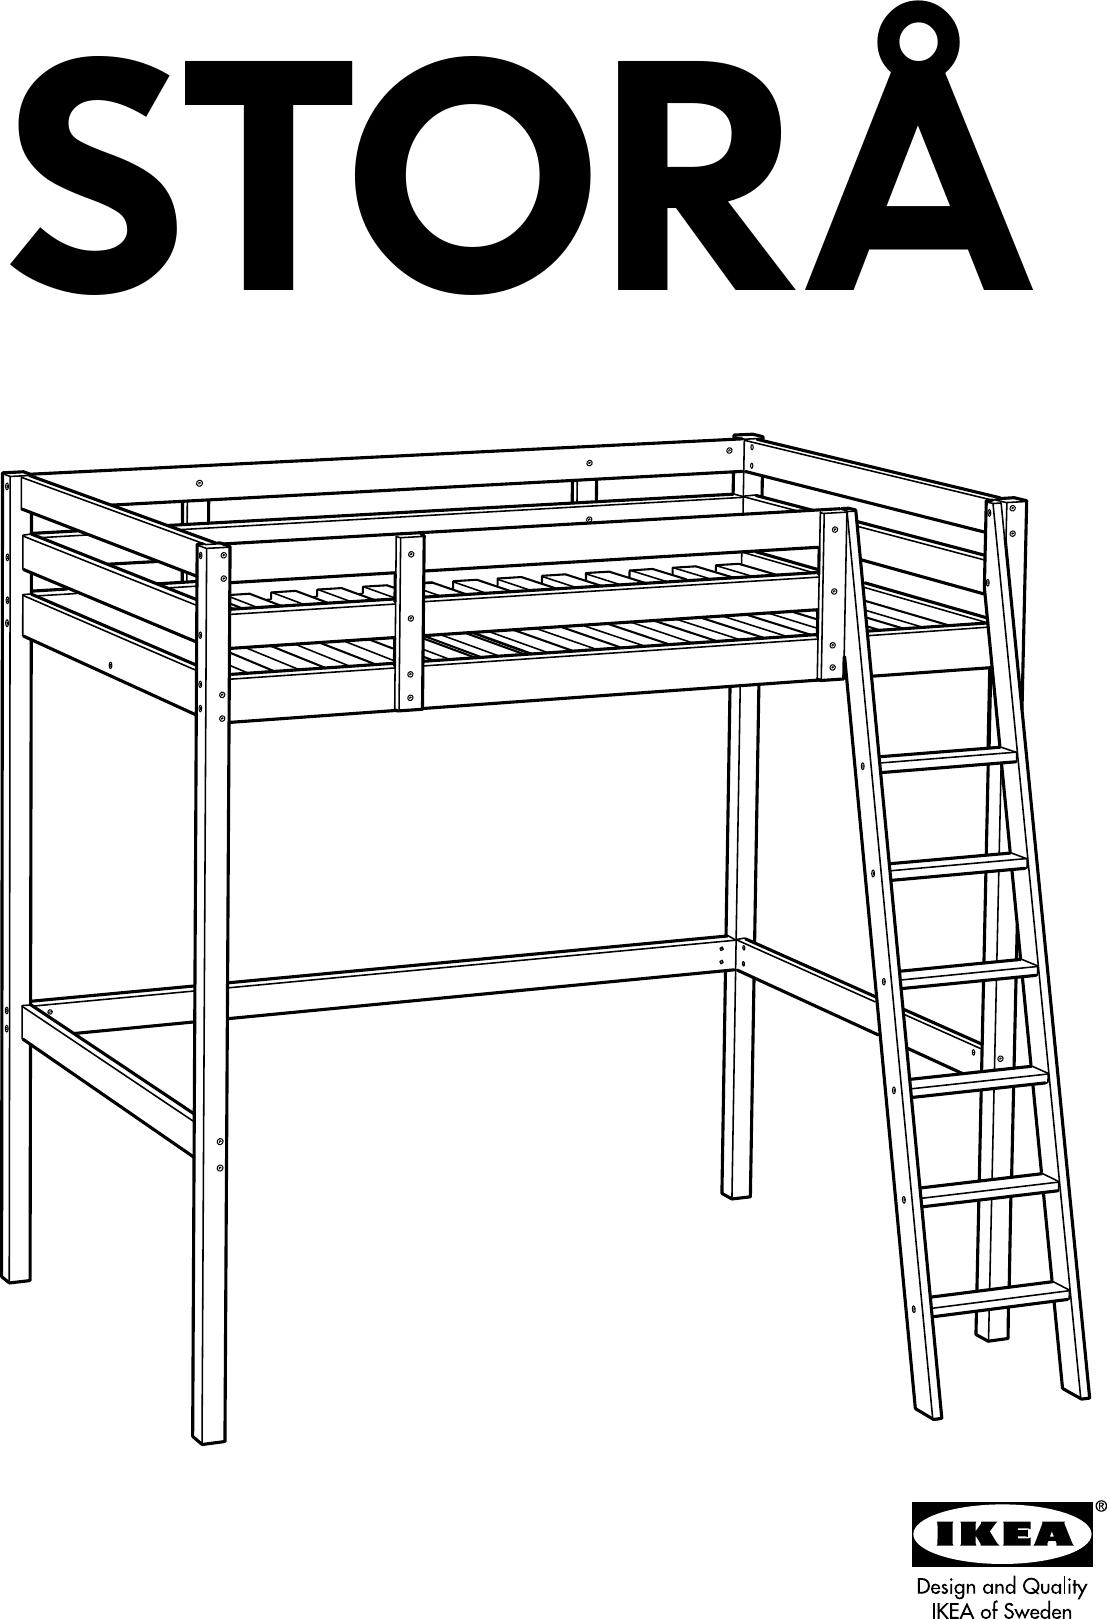 Ikea Stora Loft Bed Frame Full Double Assembly Instruction